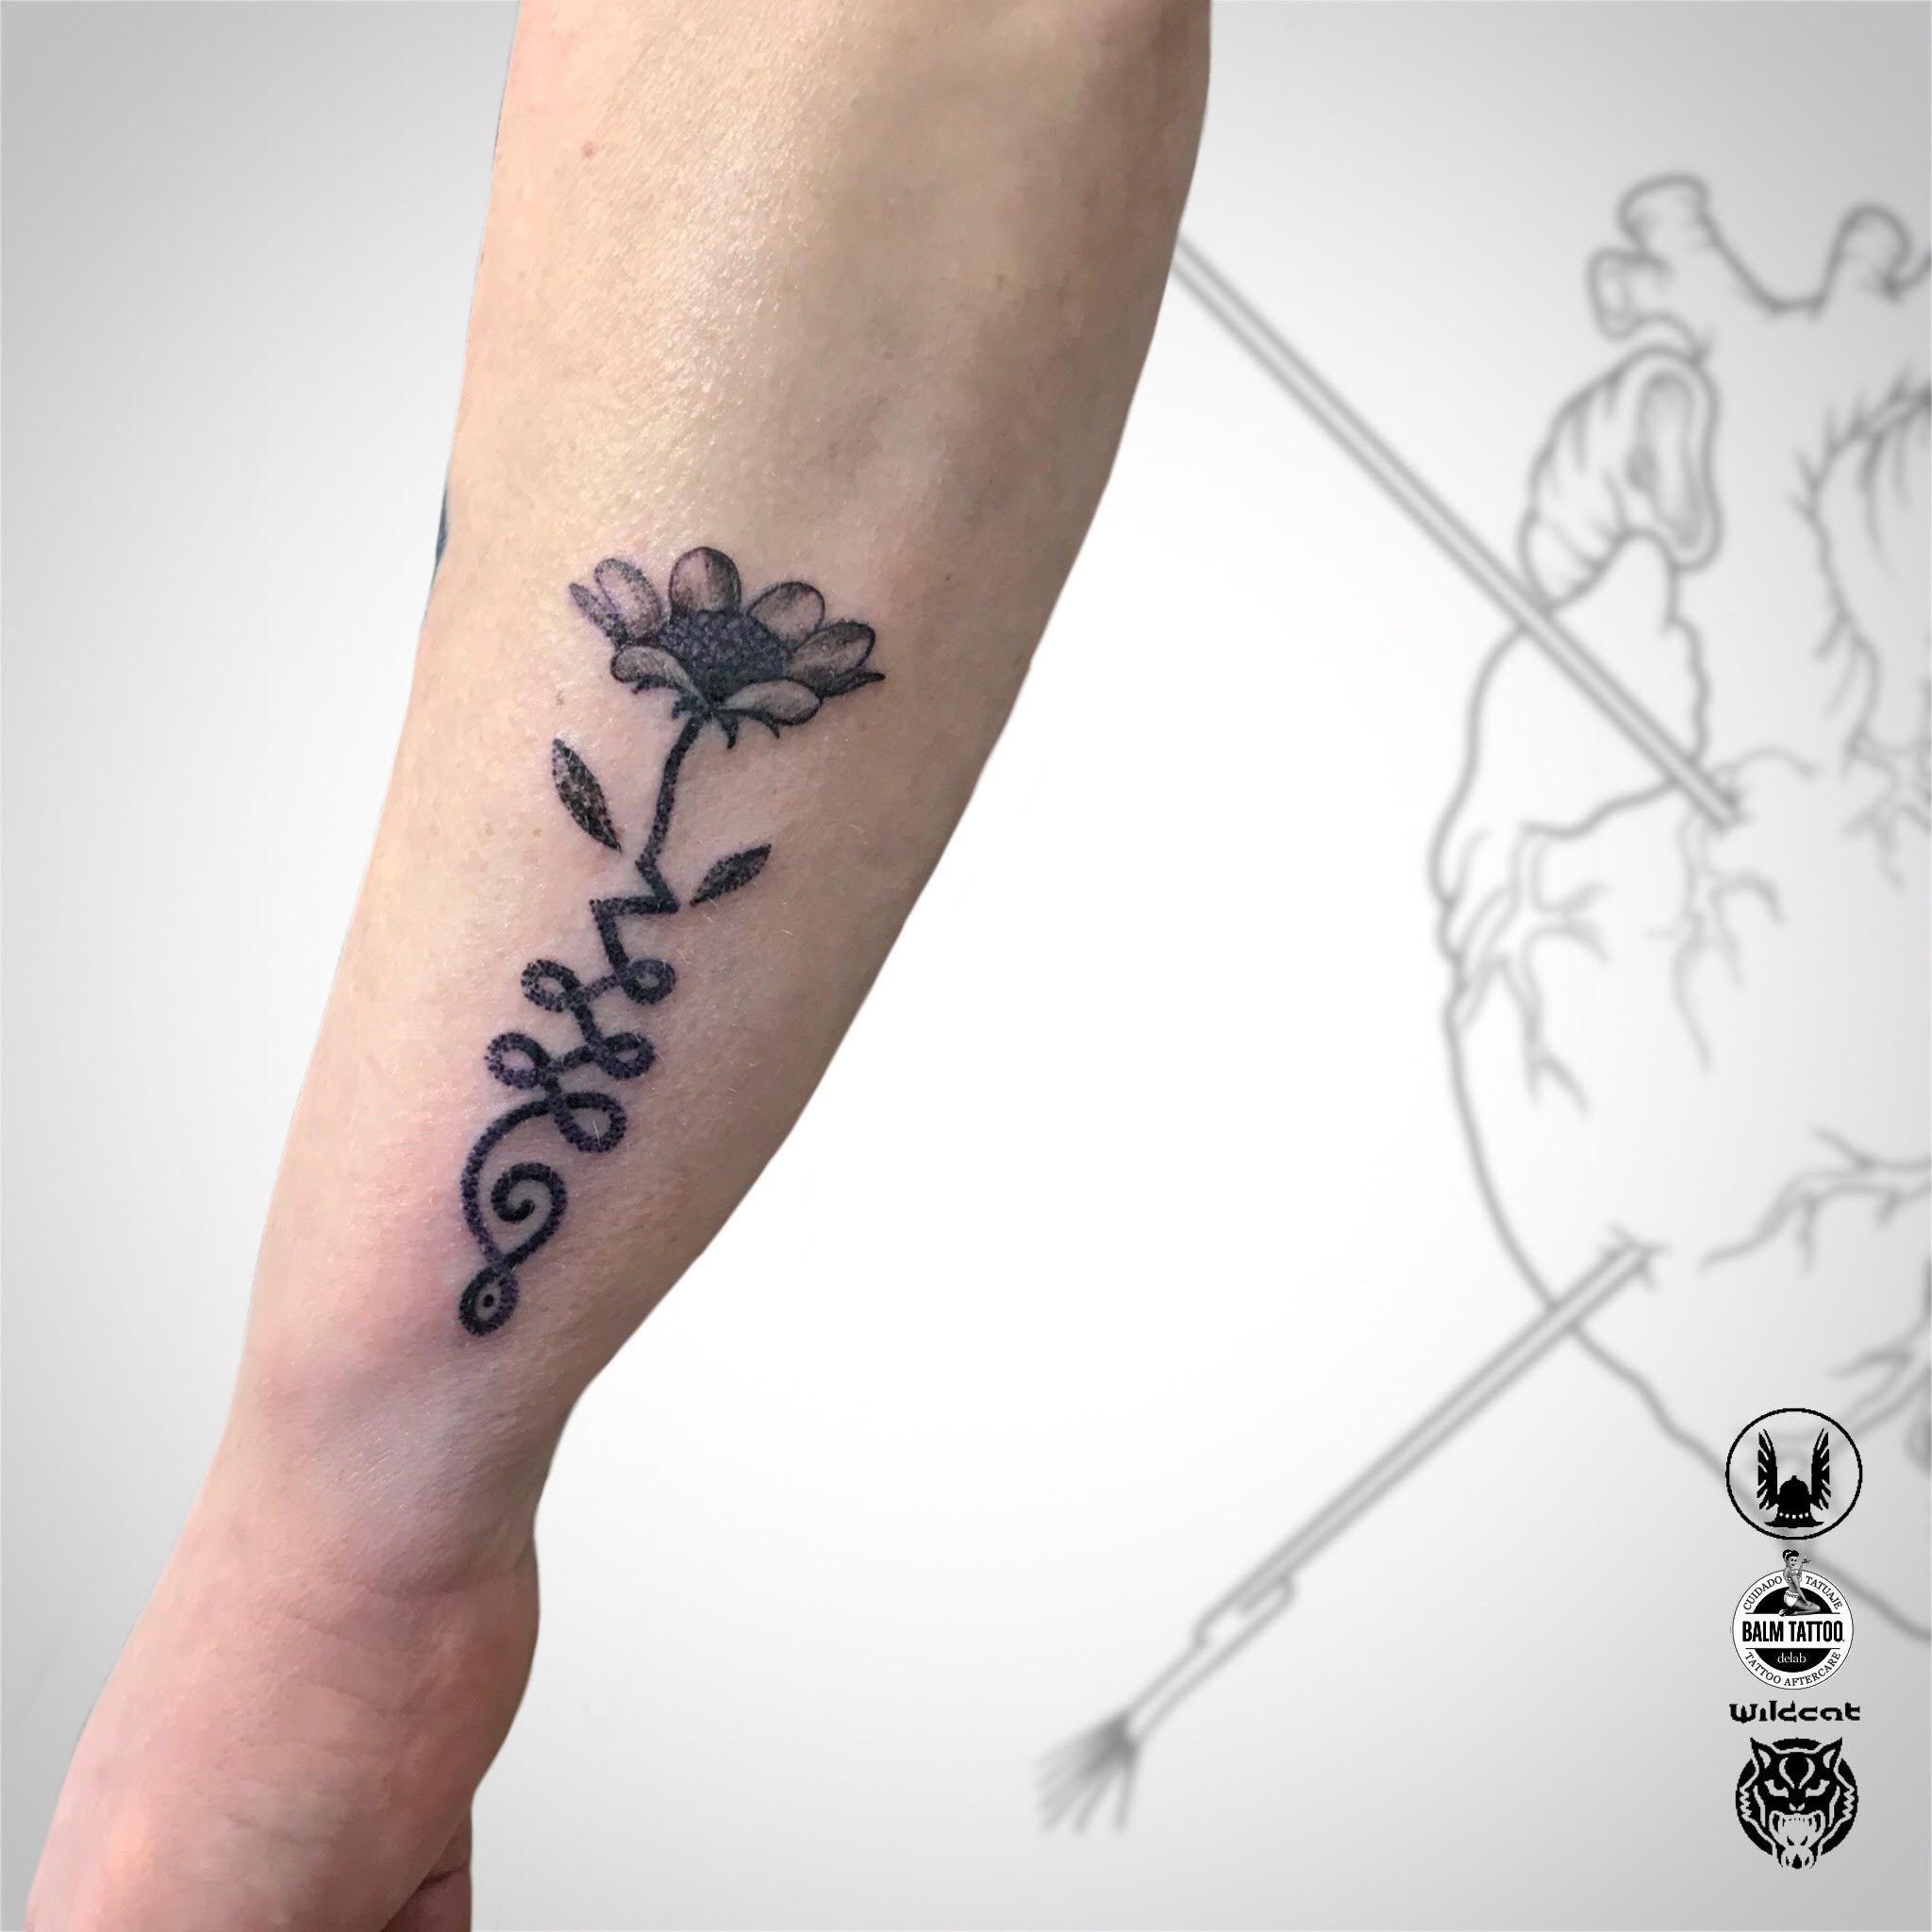 Foto 12 de Tatuajes en Santa Coloma de Gramenet | Under Skin Tattoo Santa Co